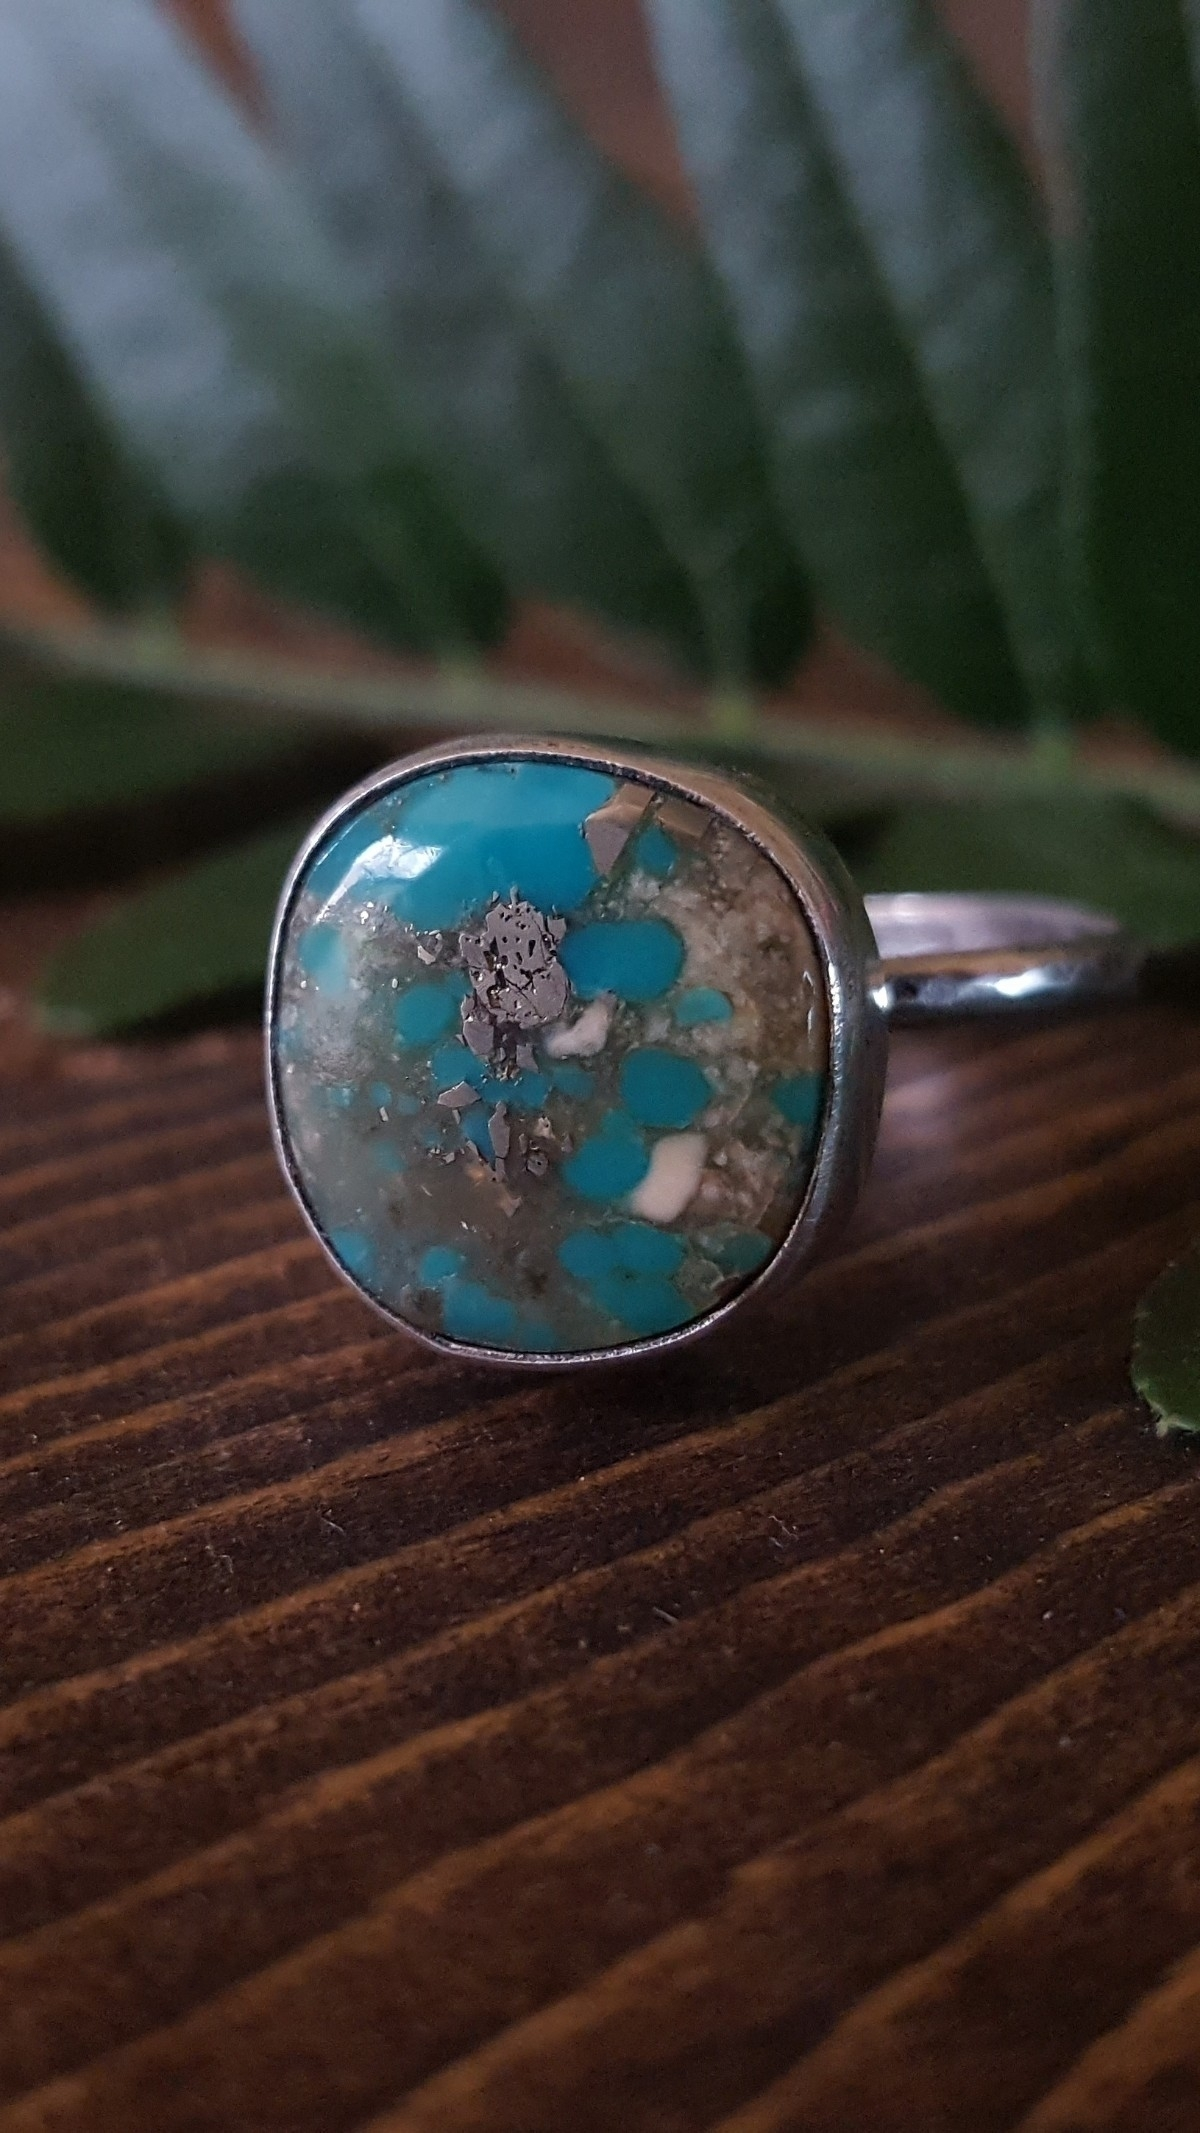 Campitos turquoise set silver | - crystalsandsucculents | ello